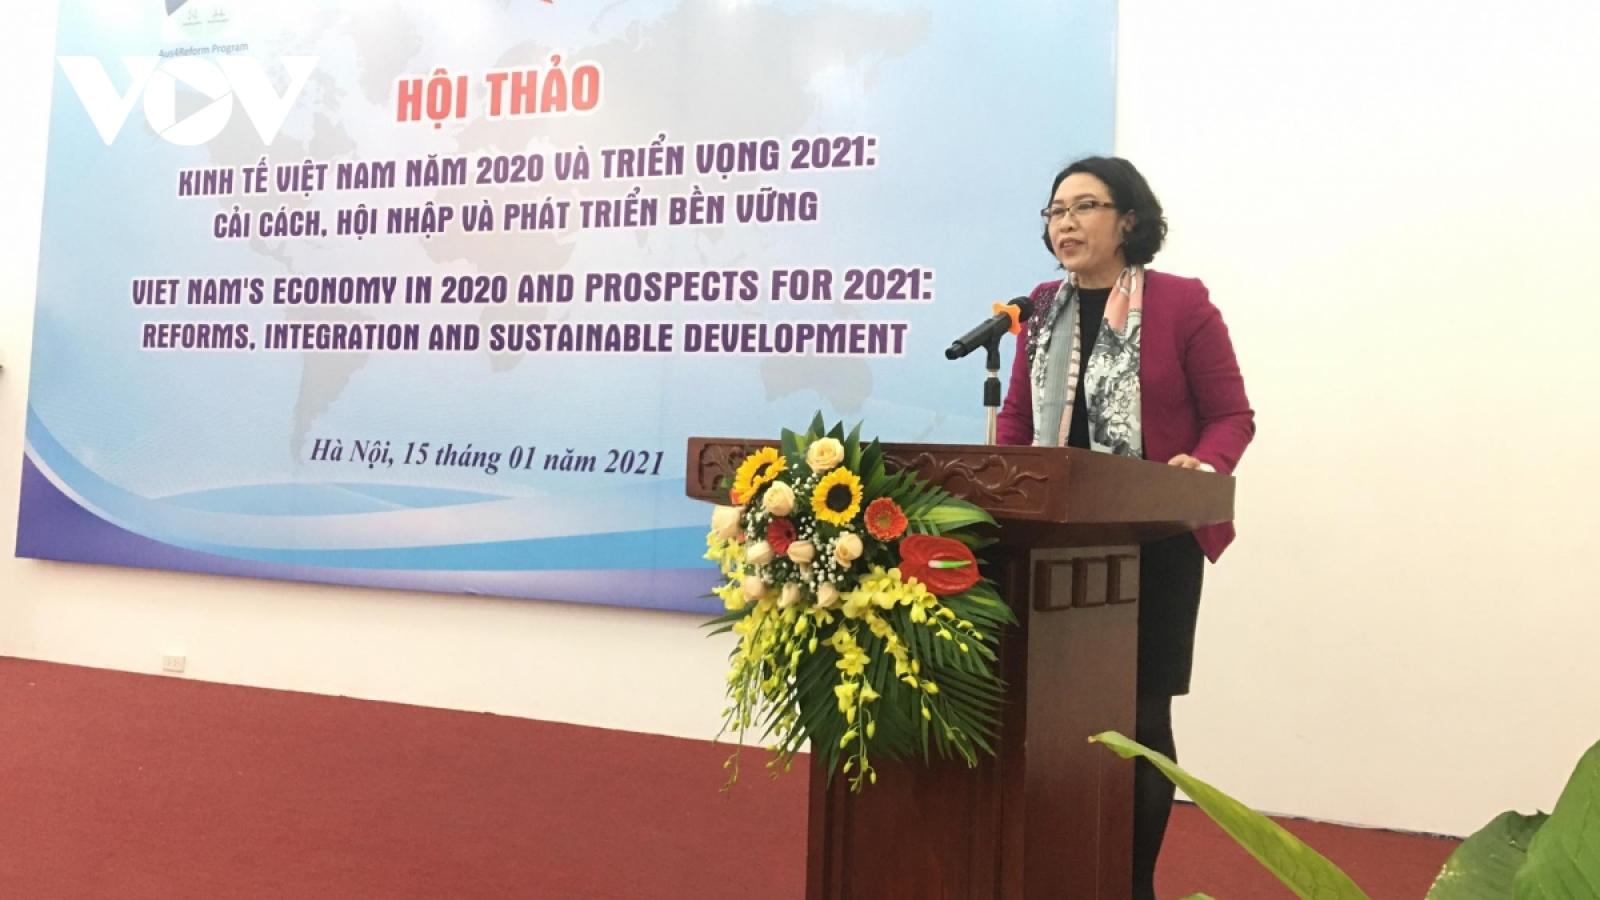 Two scenarios ahead for Vietnamese economy in 2021